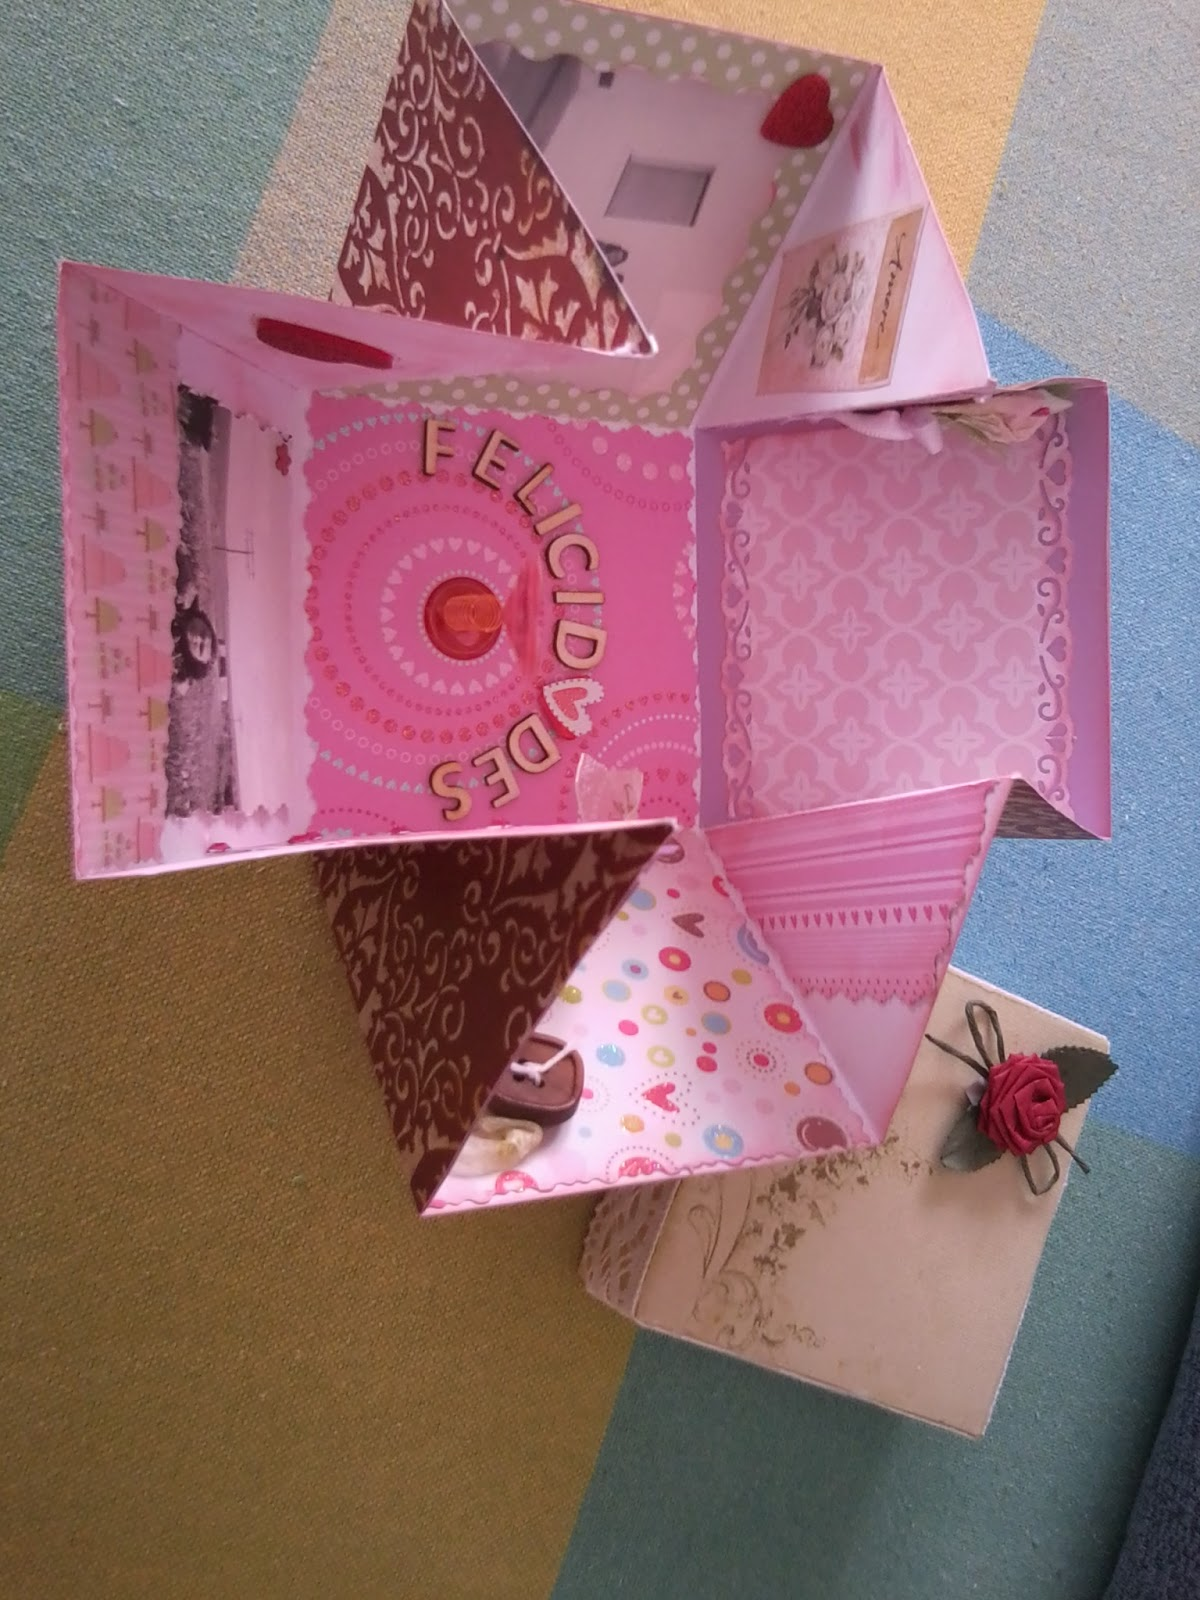 Mis scrap creaciones caja sorpresa para aniversario for Sorpresas para aniversario